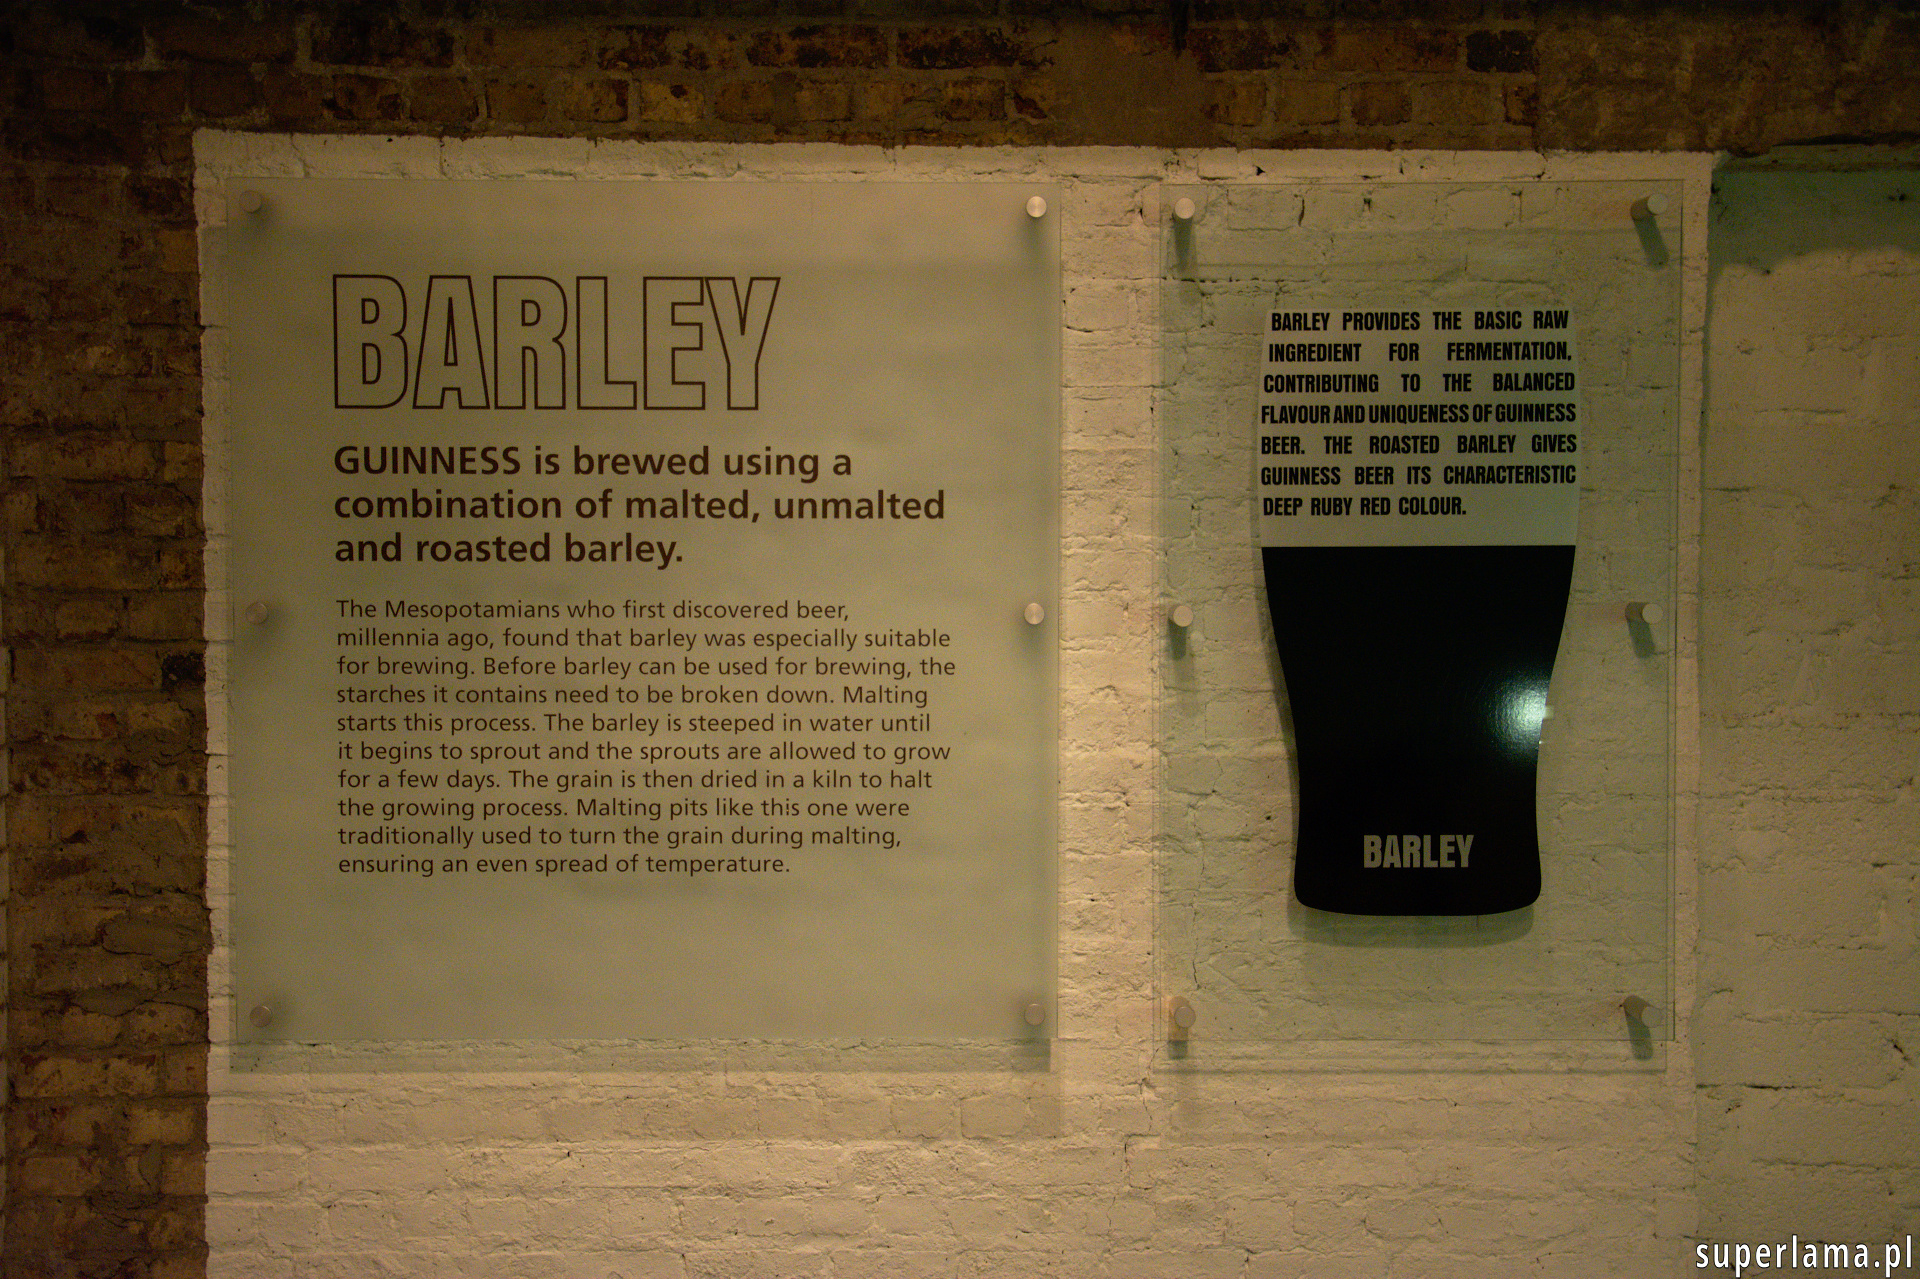 guinness barley - jęczmień